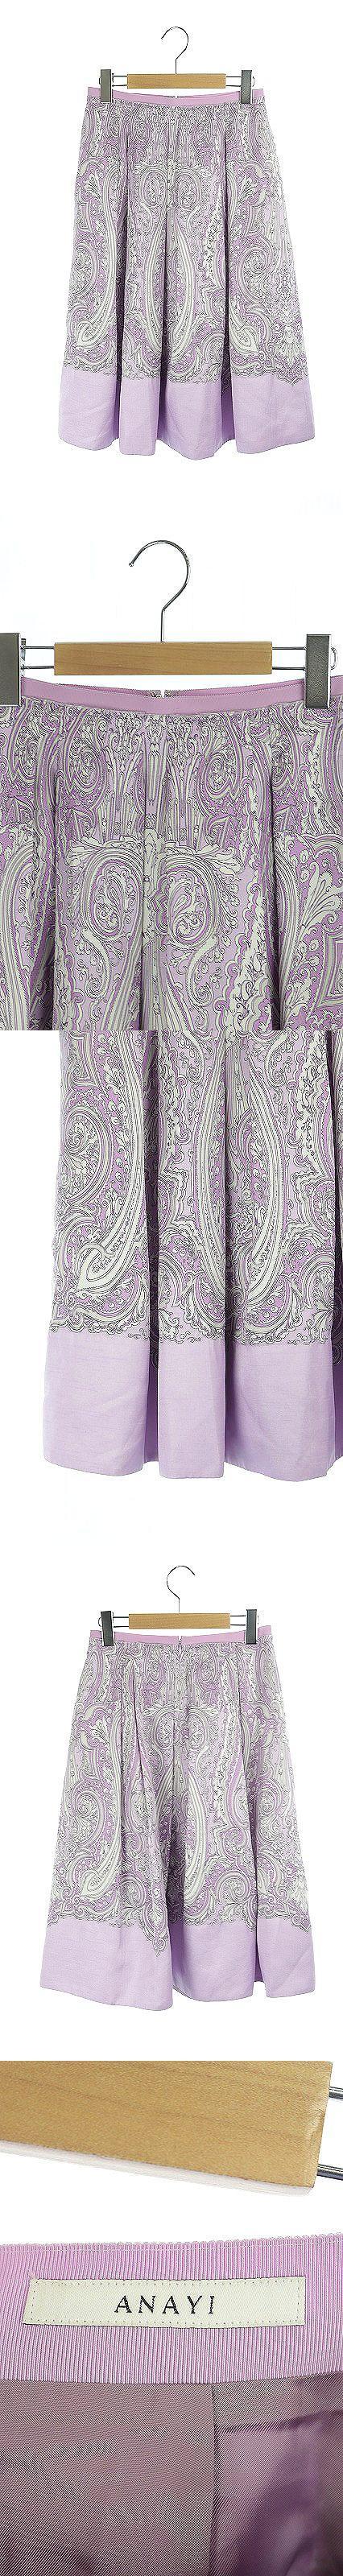 19SS スカート ロング ミモレ丈 フレア ペイズリー柄 総柄 36 紫 /MI ■OS